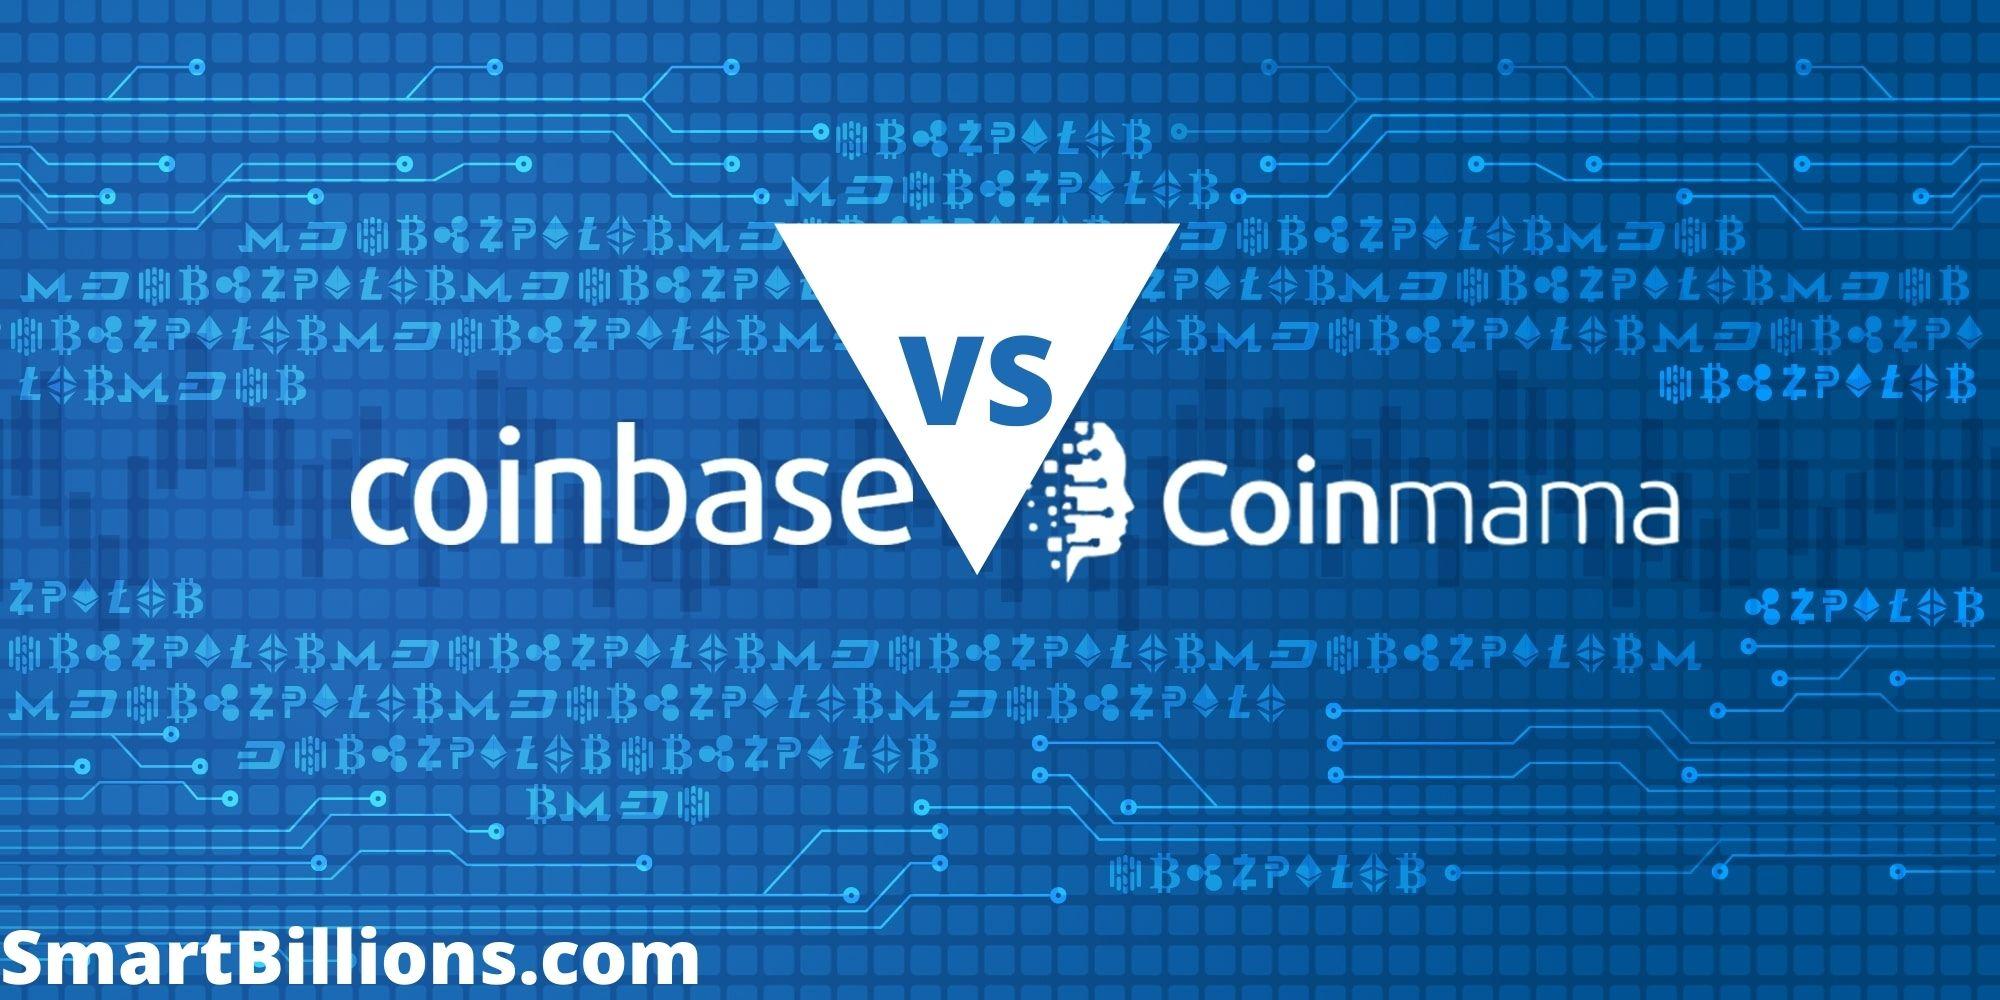 coinbase vs coinmama